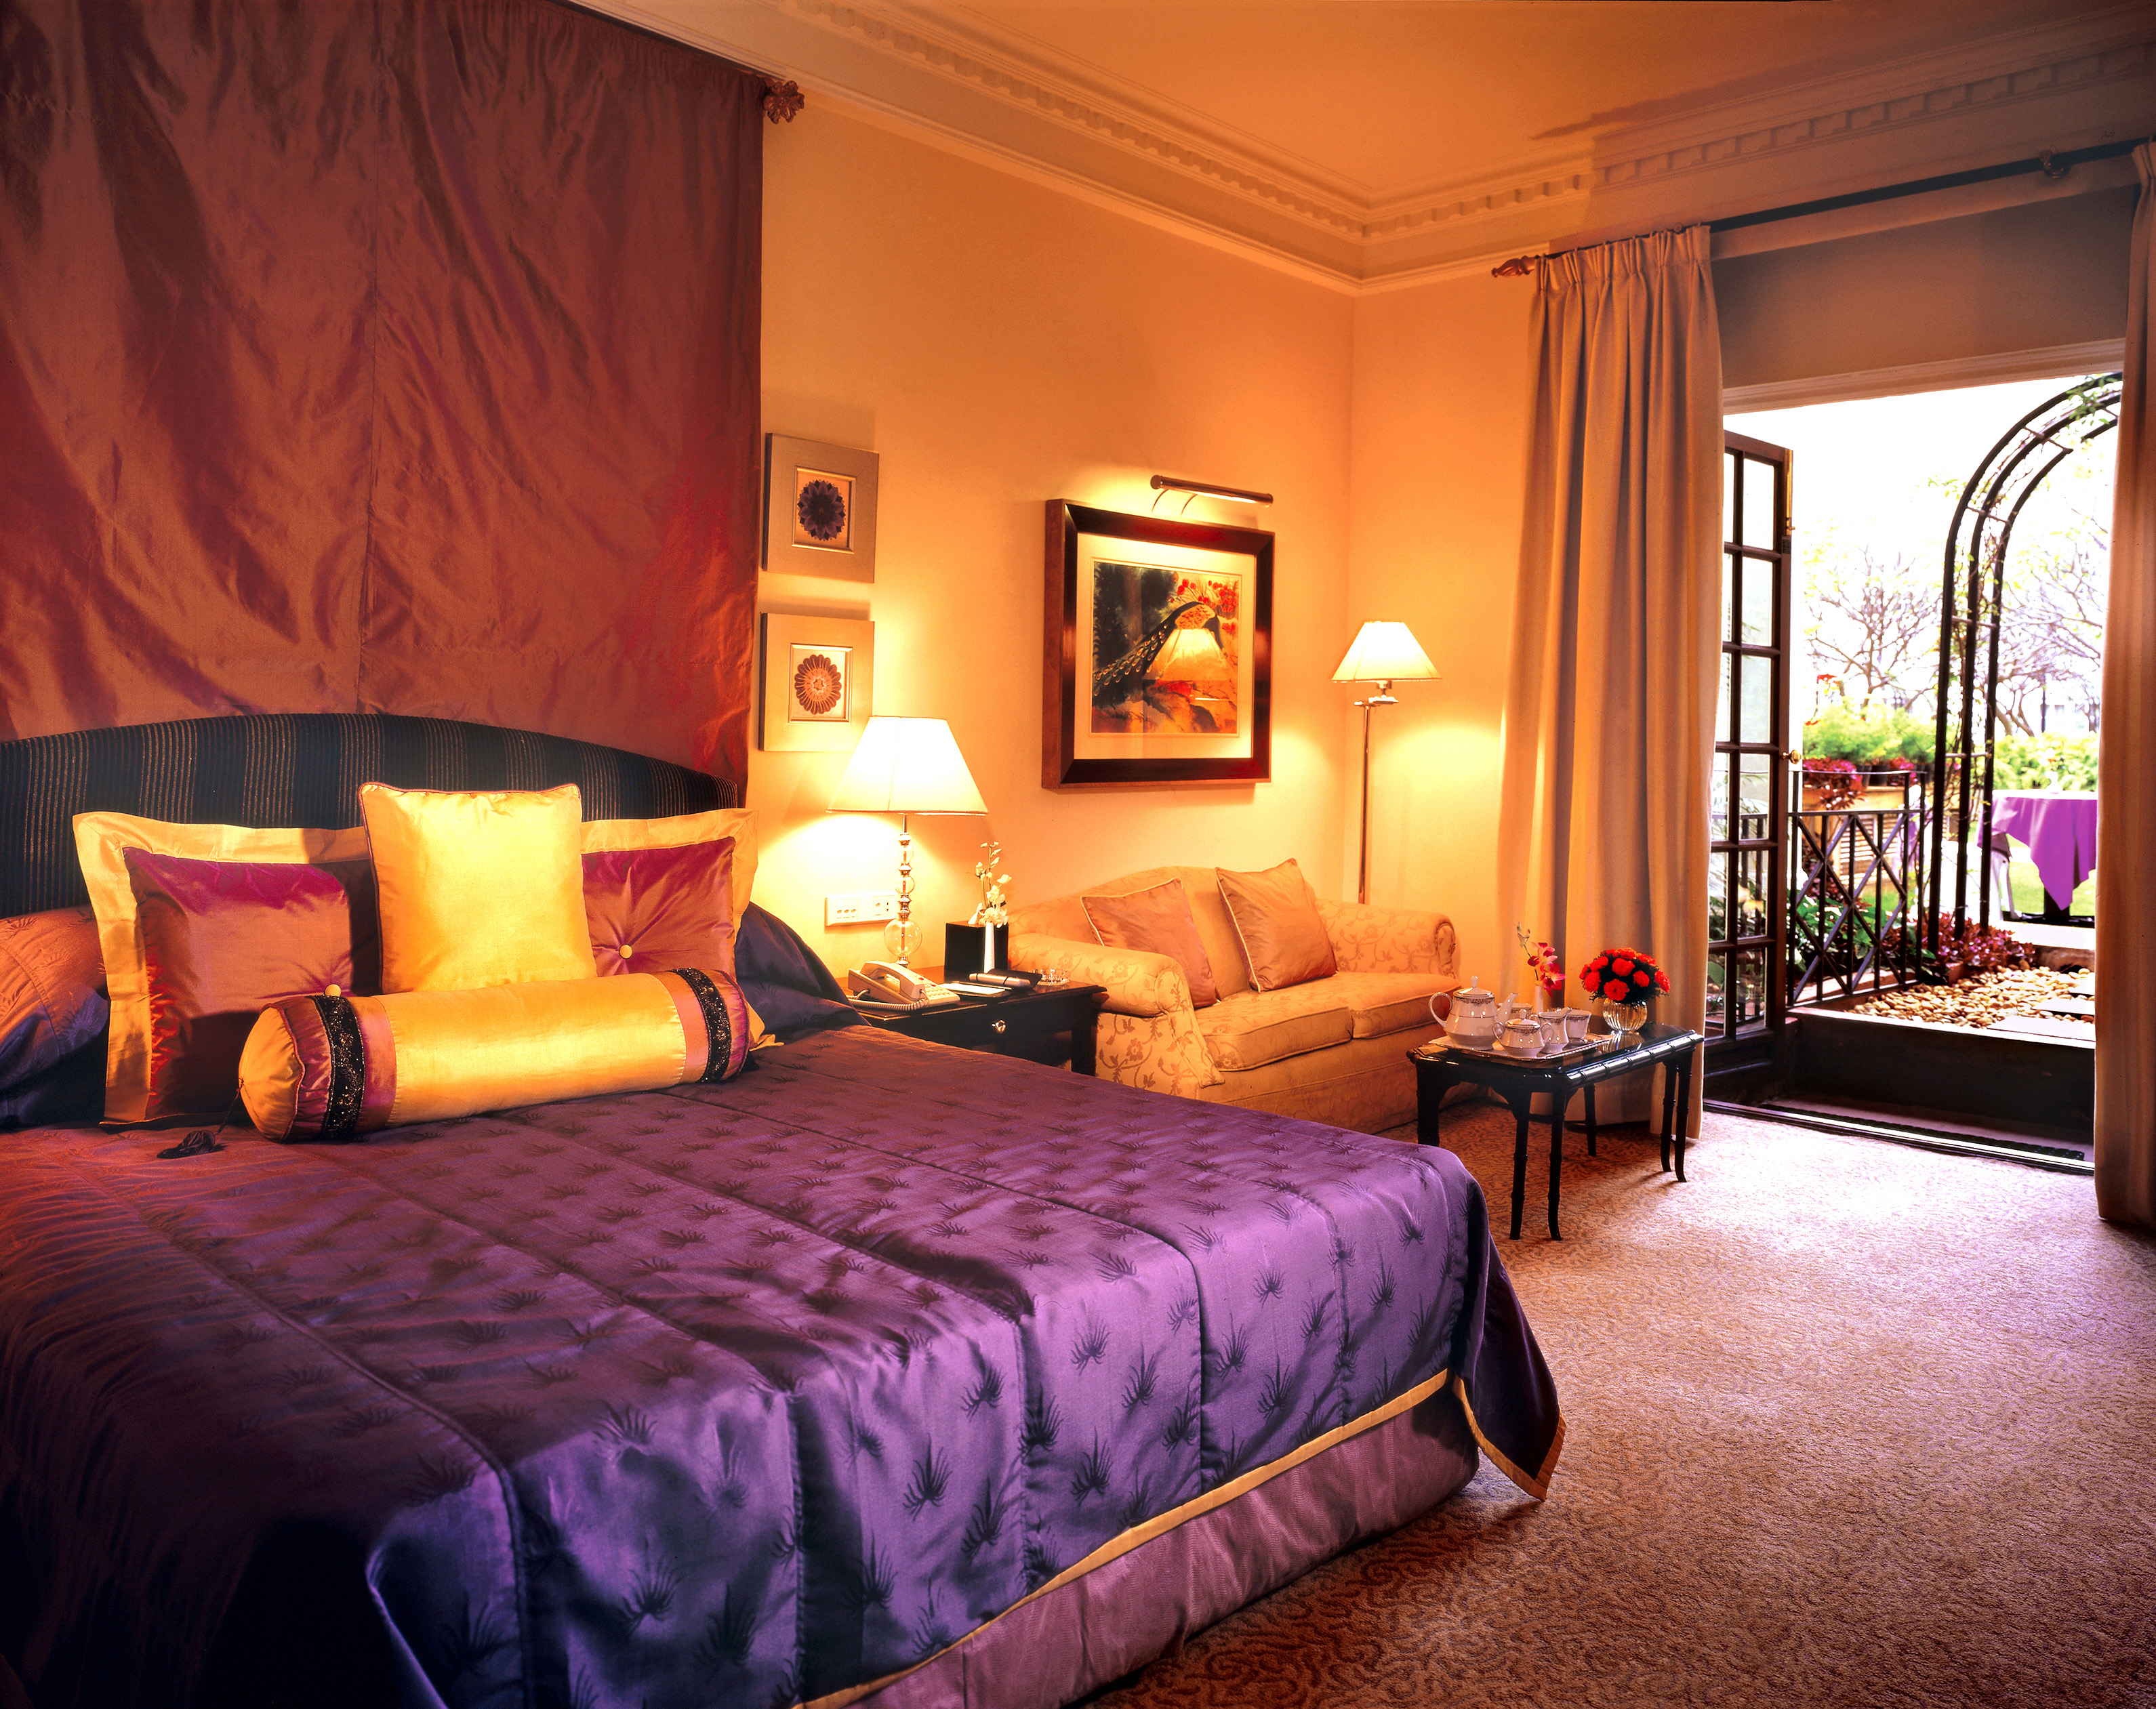 Itc windsor bengaluru hotel - Hoteles de lujo granada ...